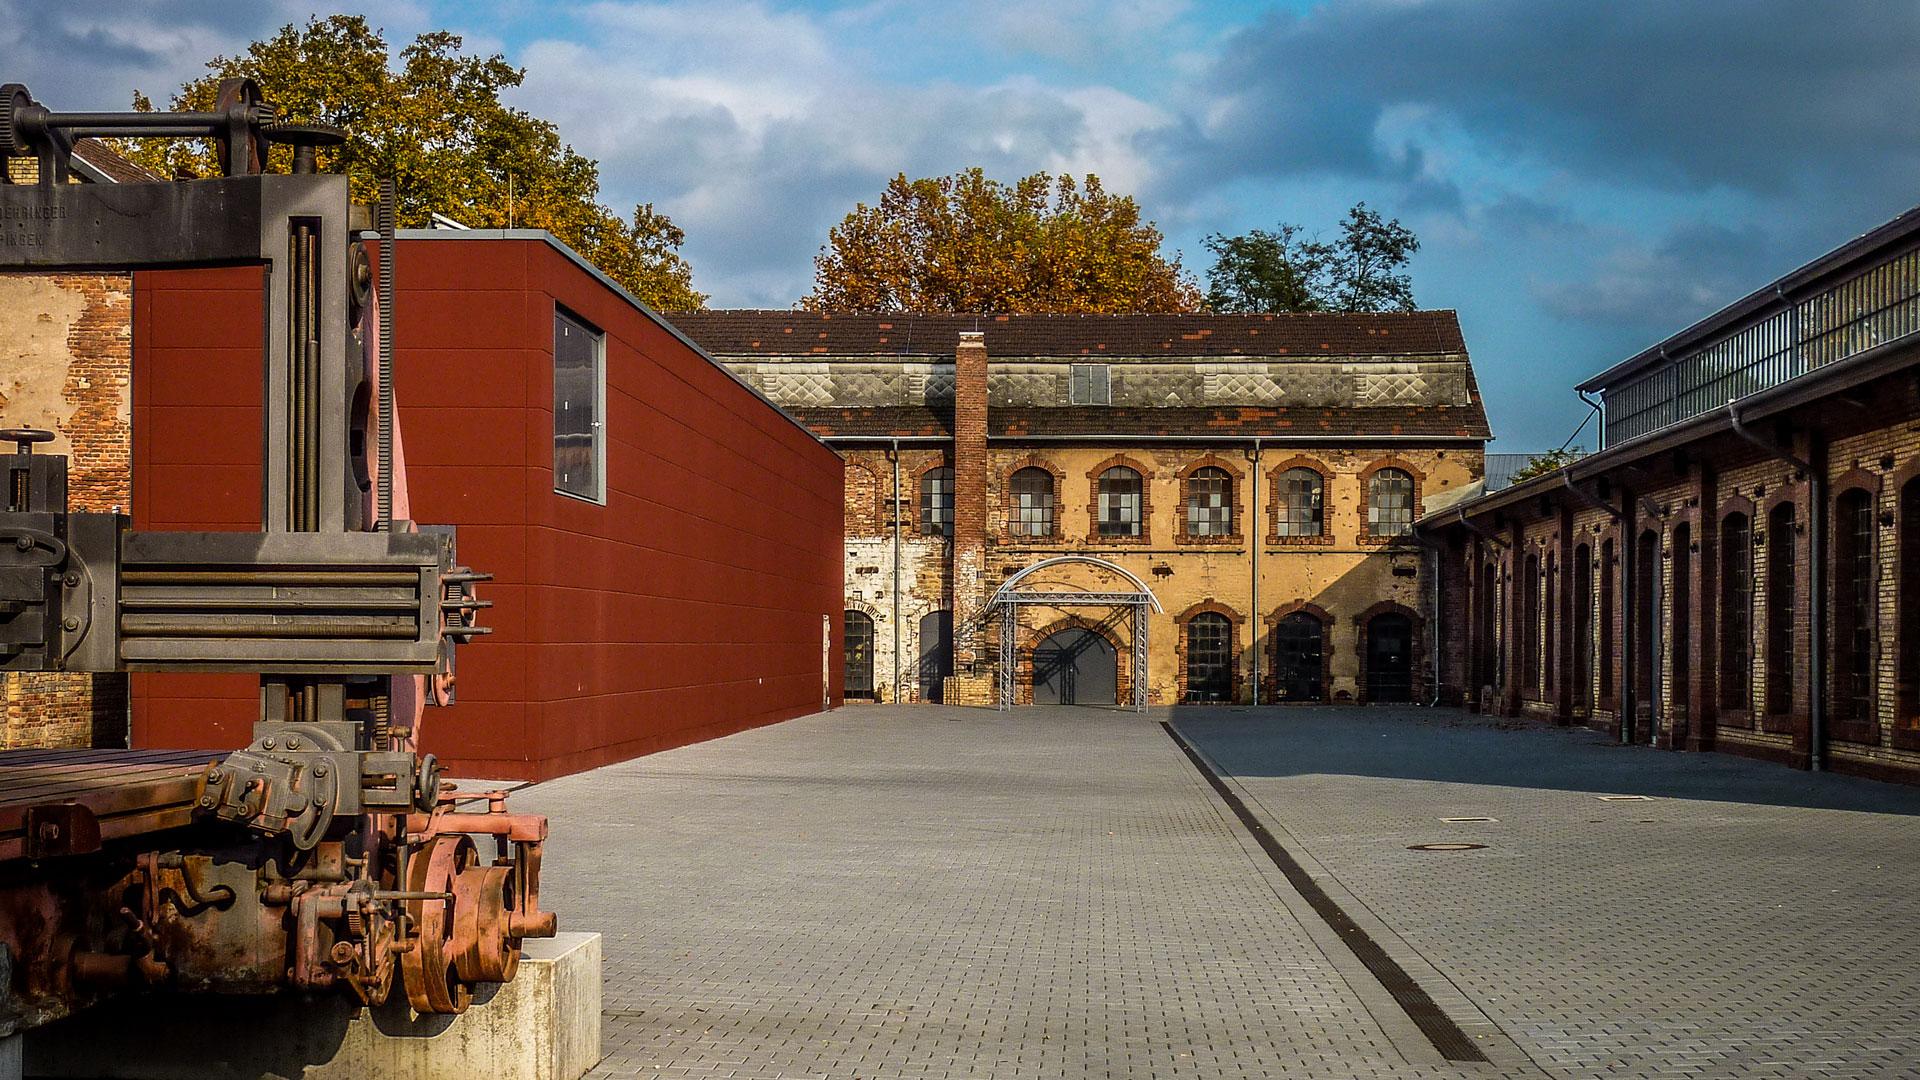 Umbau, Sanierung, Kulturbau